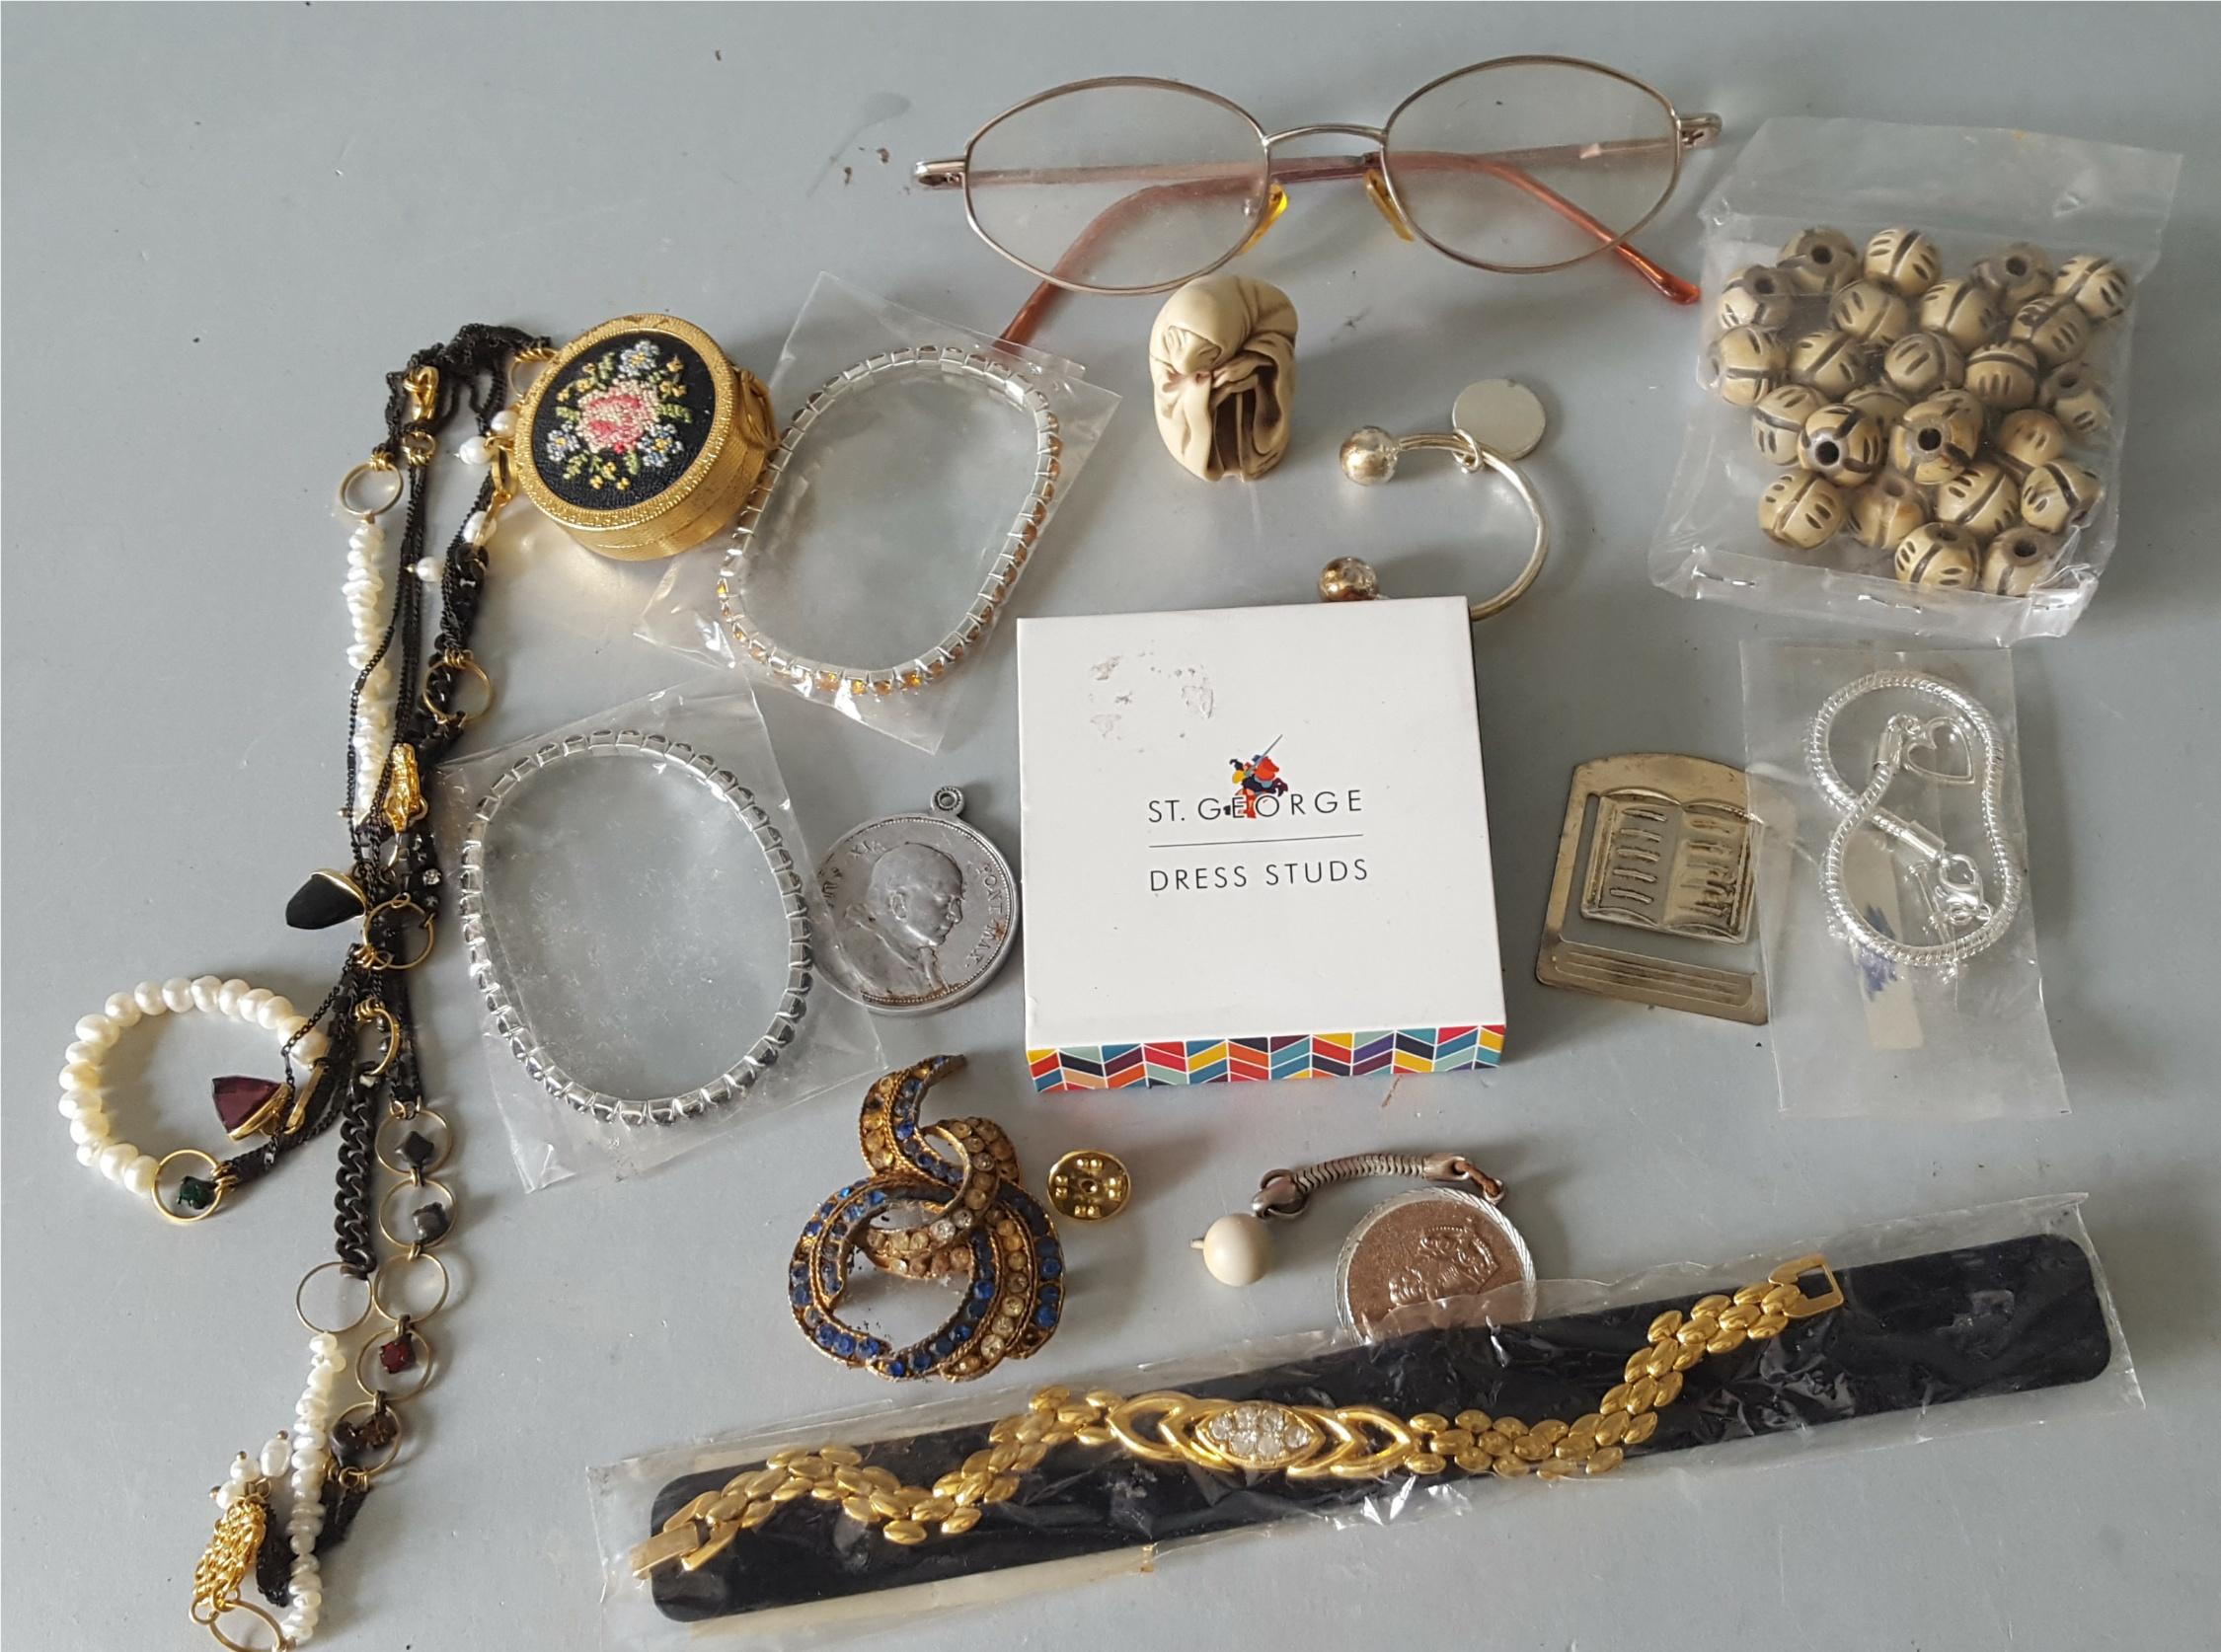 Lot 111 - Vintage Retro Parcel Costume Jewellery NO RESERVE